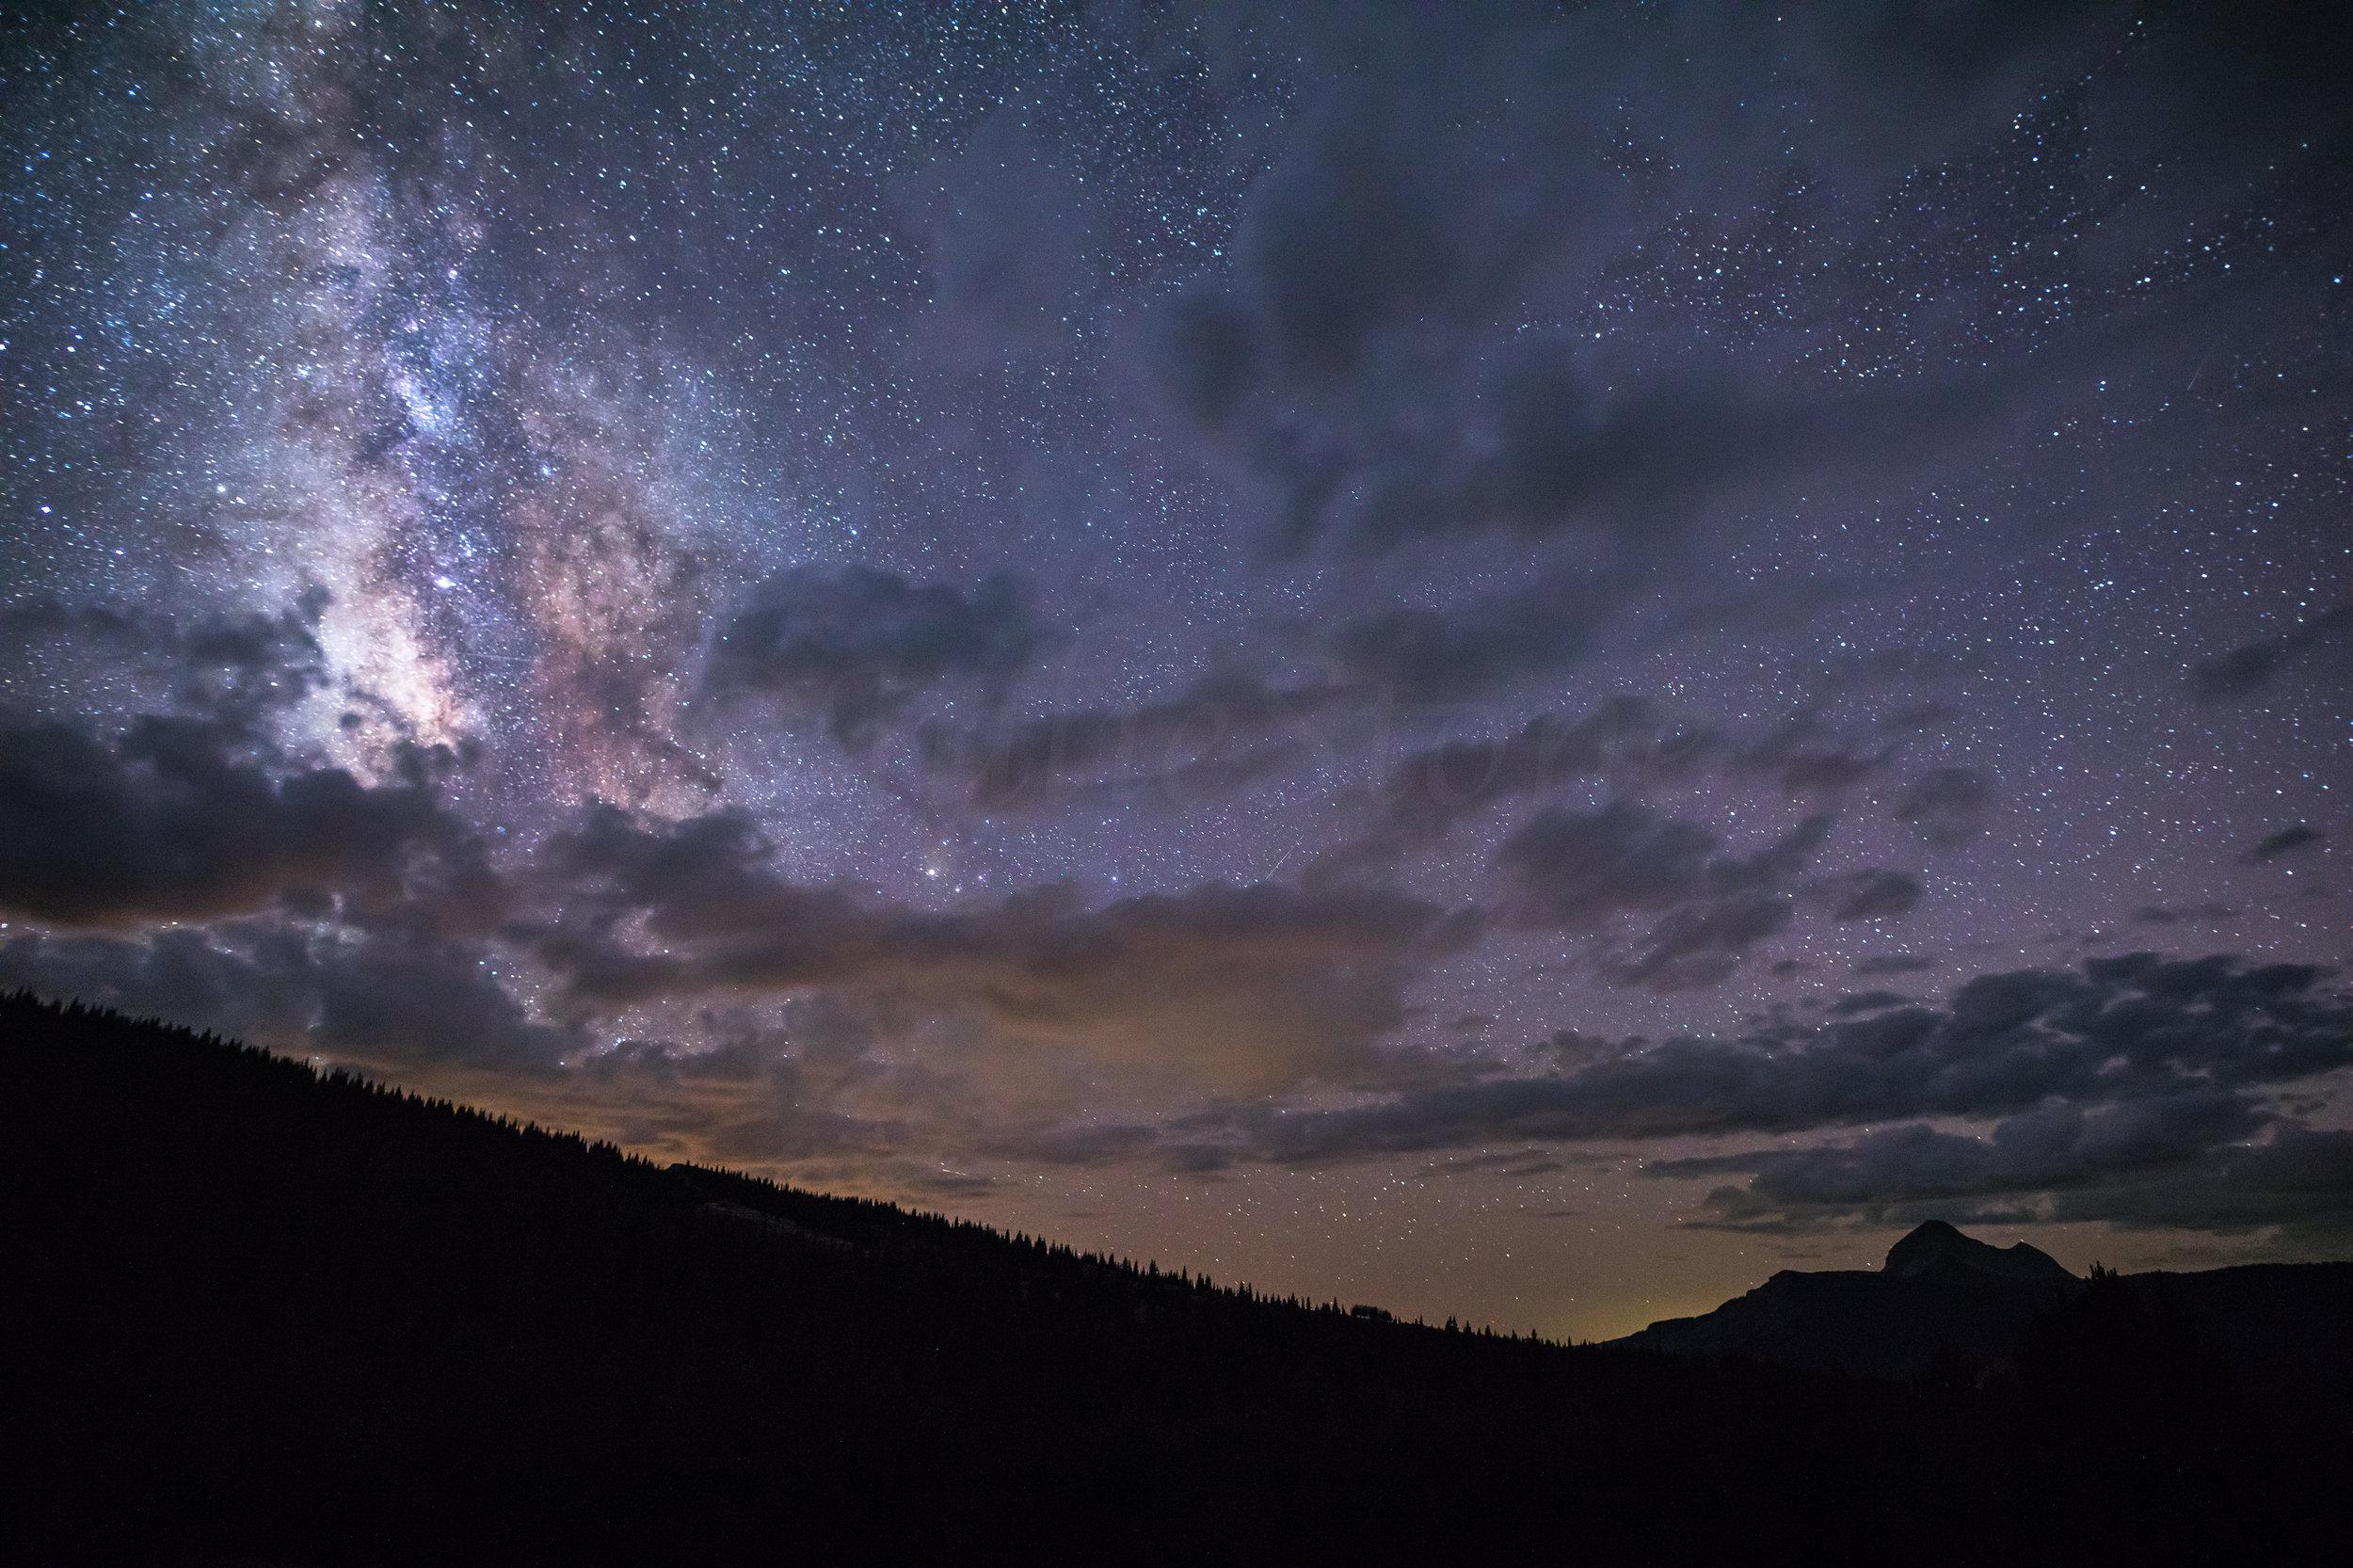 Engineer Mountain Milky Way, Image # 7485